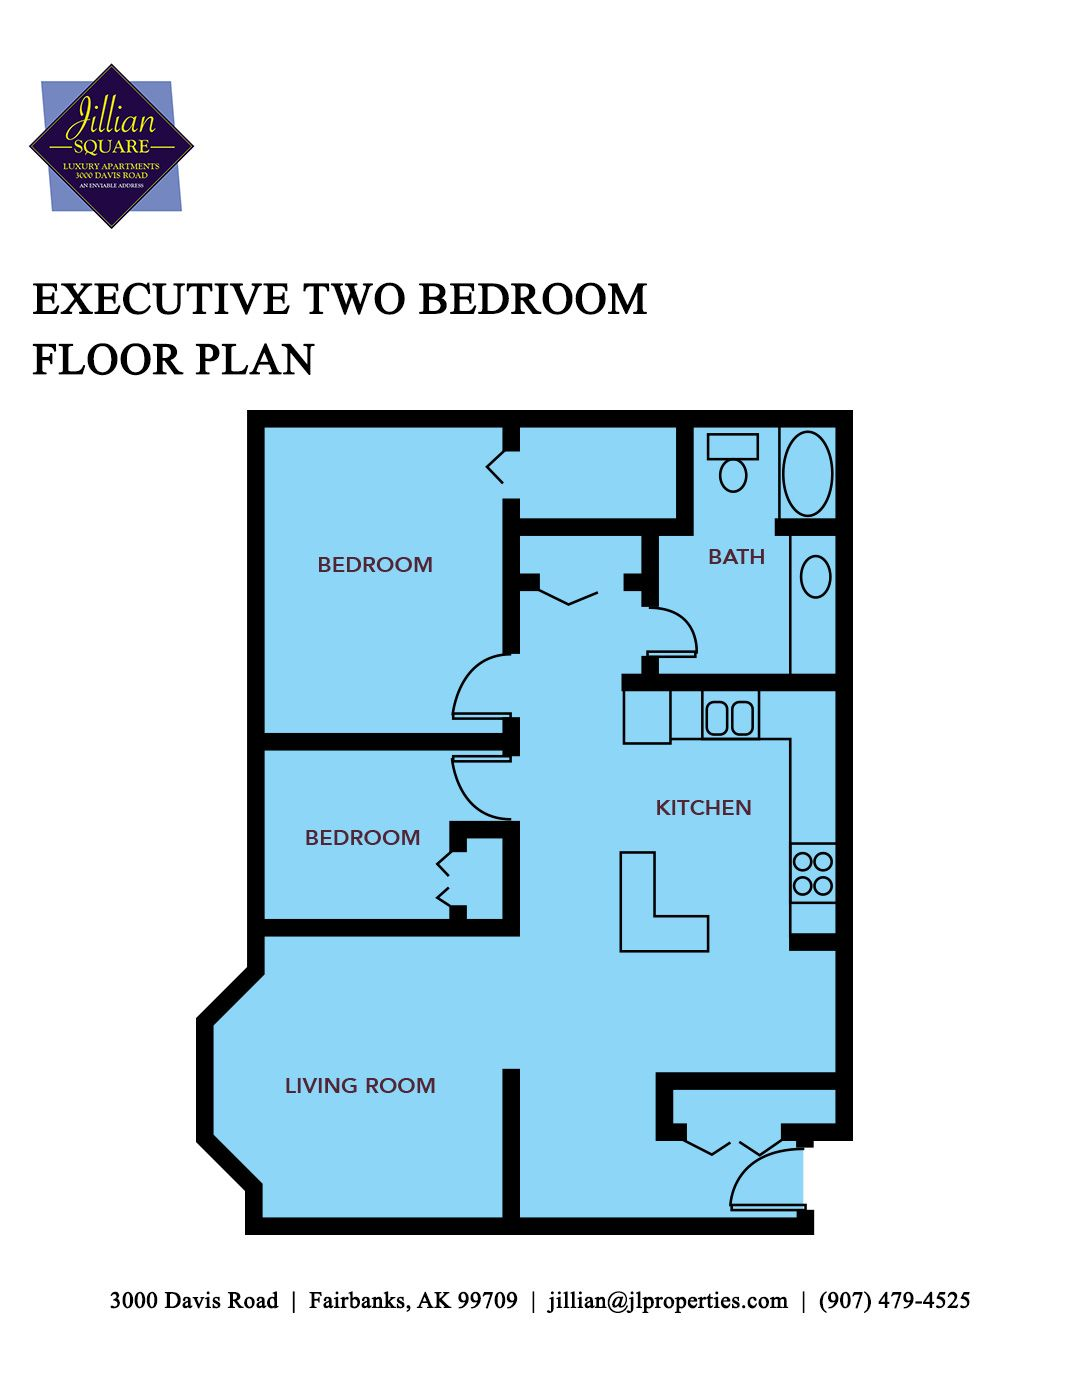 fairbanks alaska apartments jillian square apartments maps and executive